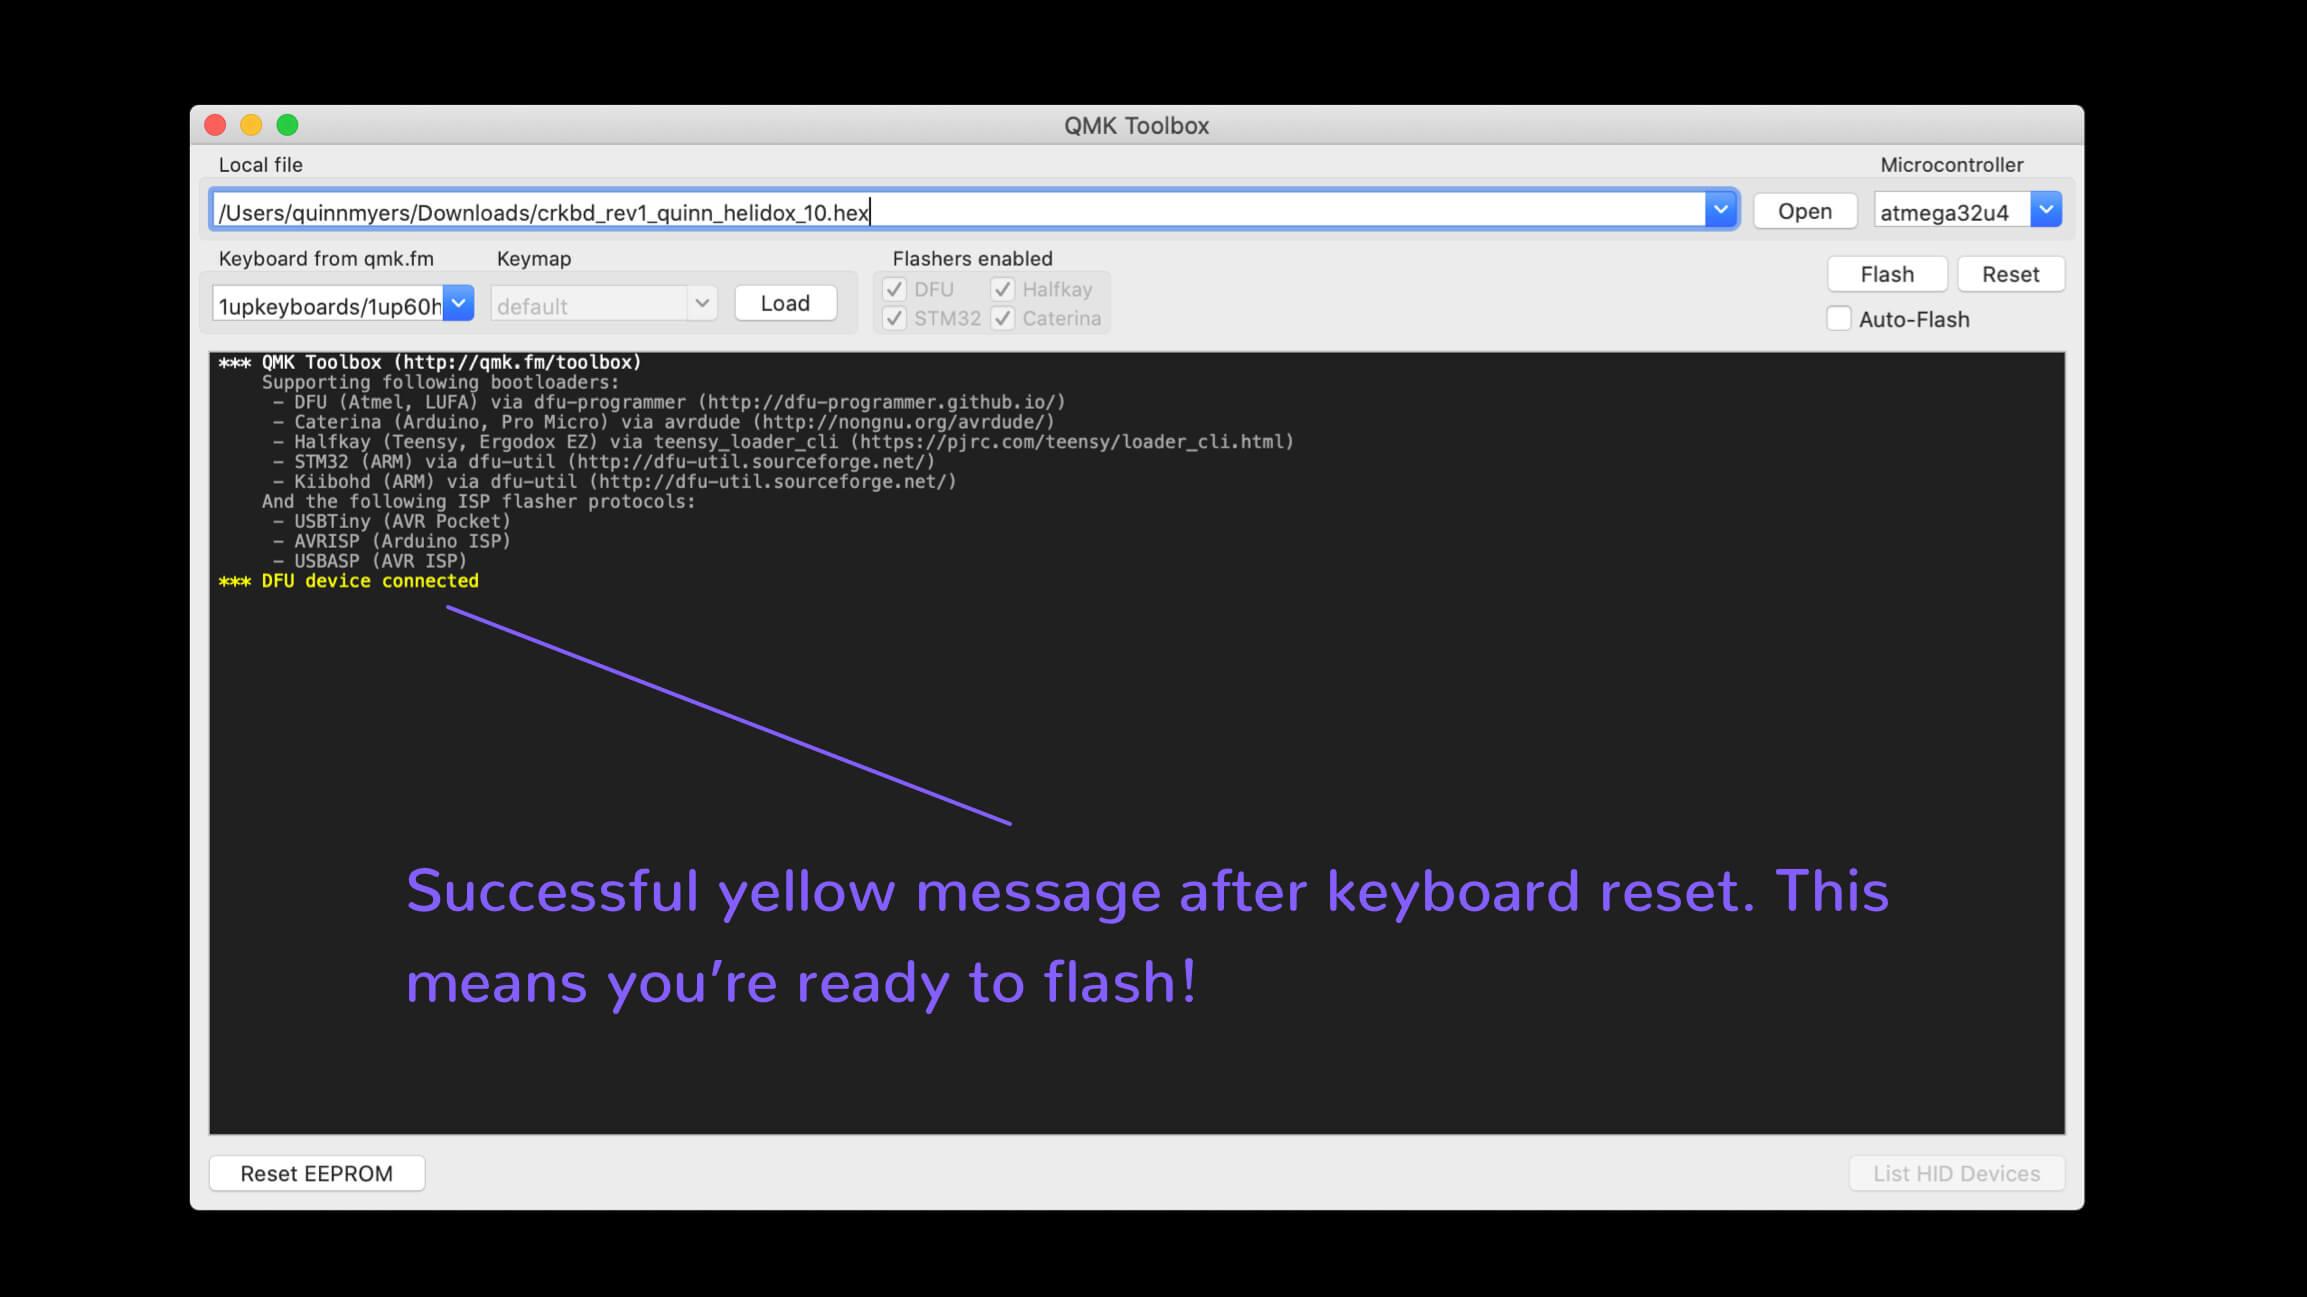 qmk toolbox reset success yellow message